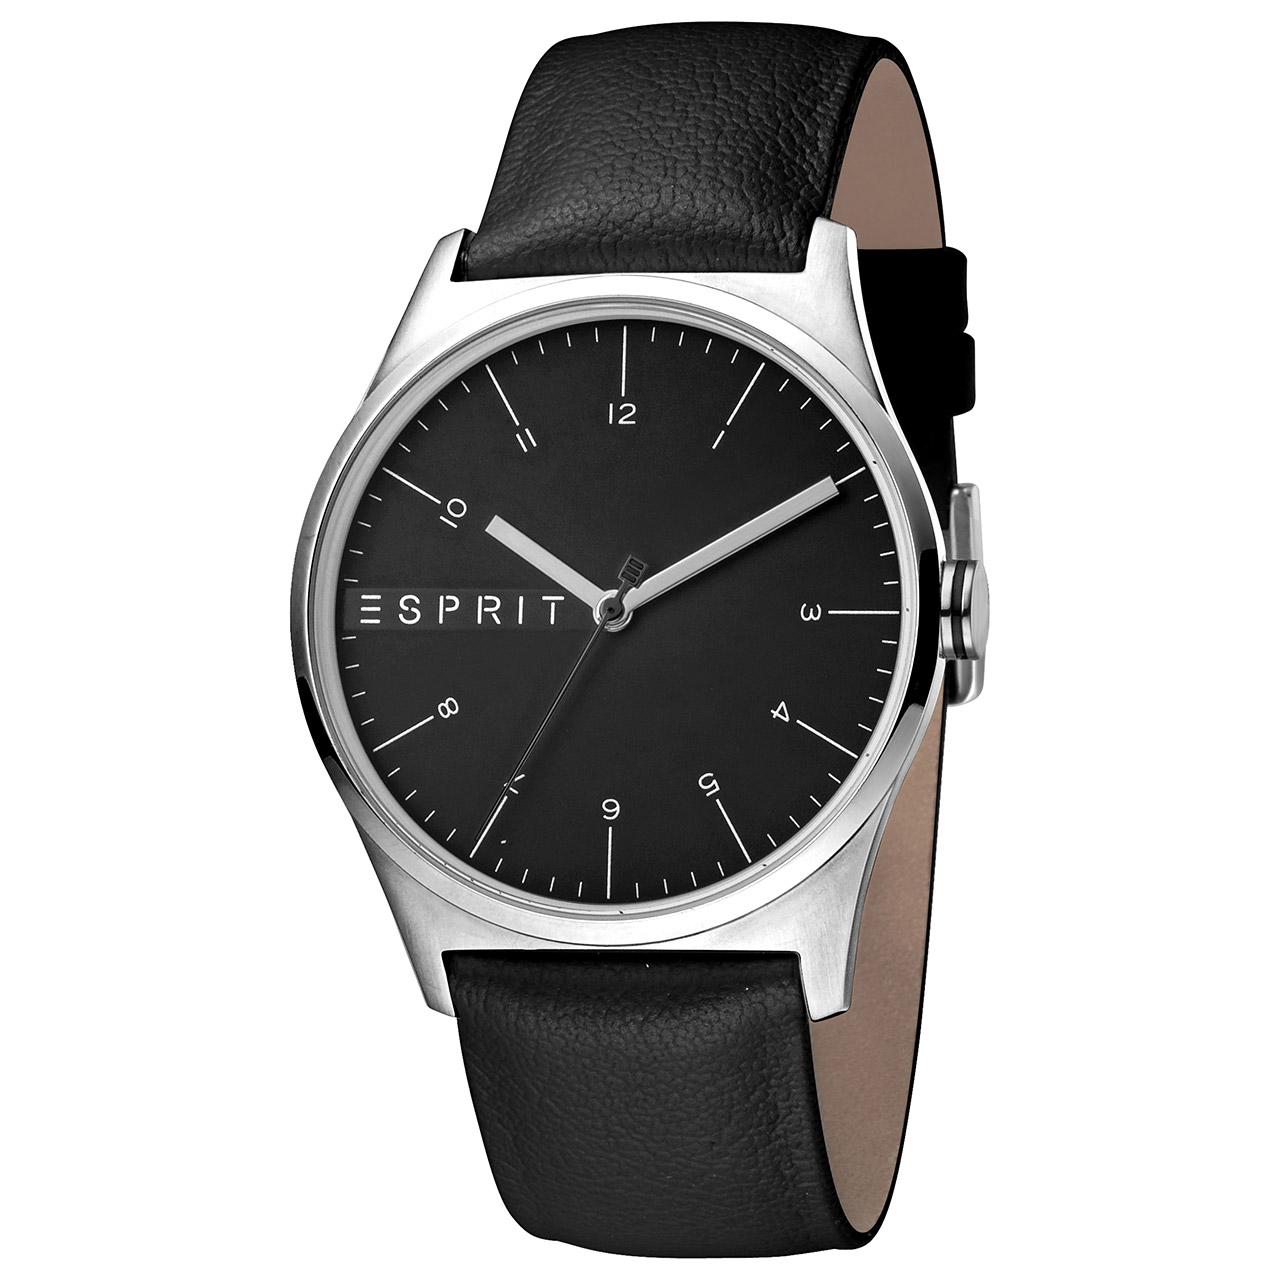 ساعت مچی عقربه ای مردانه اسپریت مدل ES1G034L0025